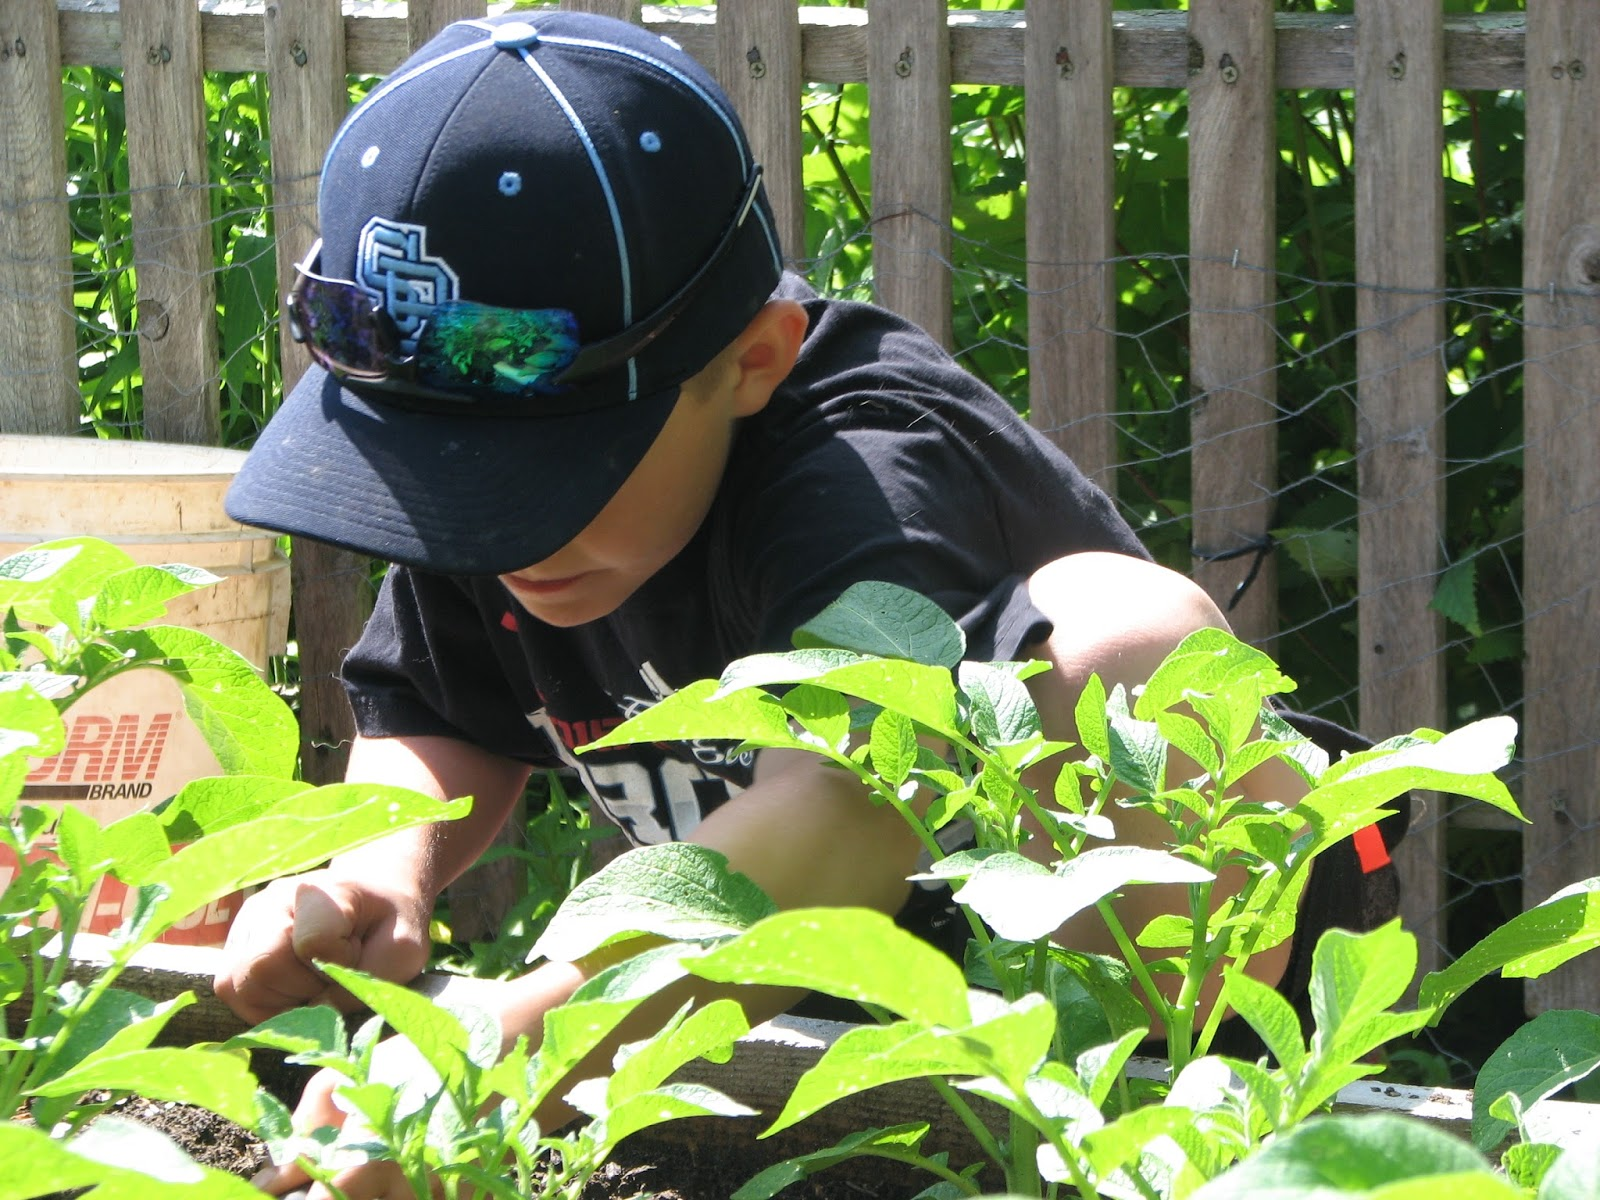 Growing young gardeners club pollinators and blooms for The gardener burlington